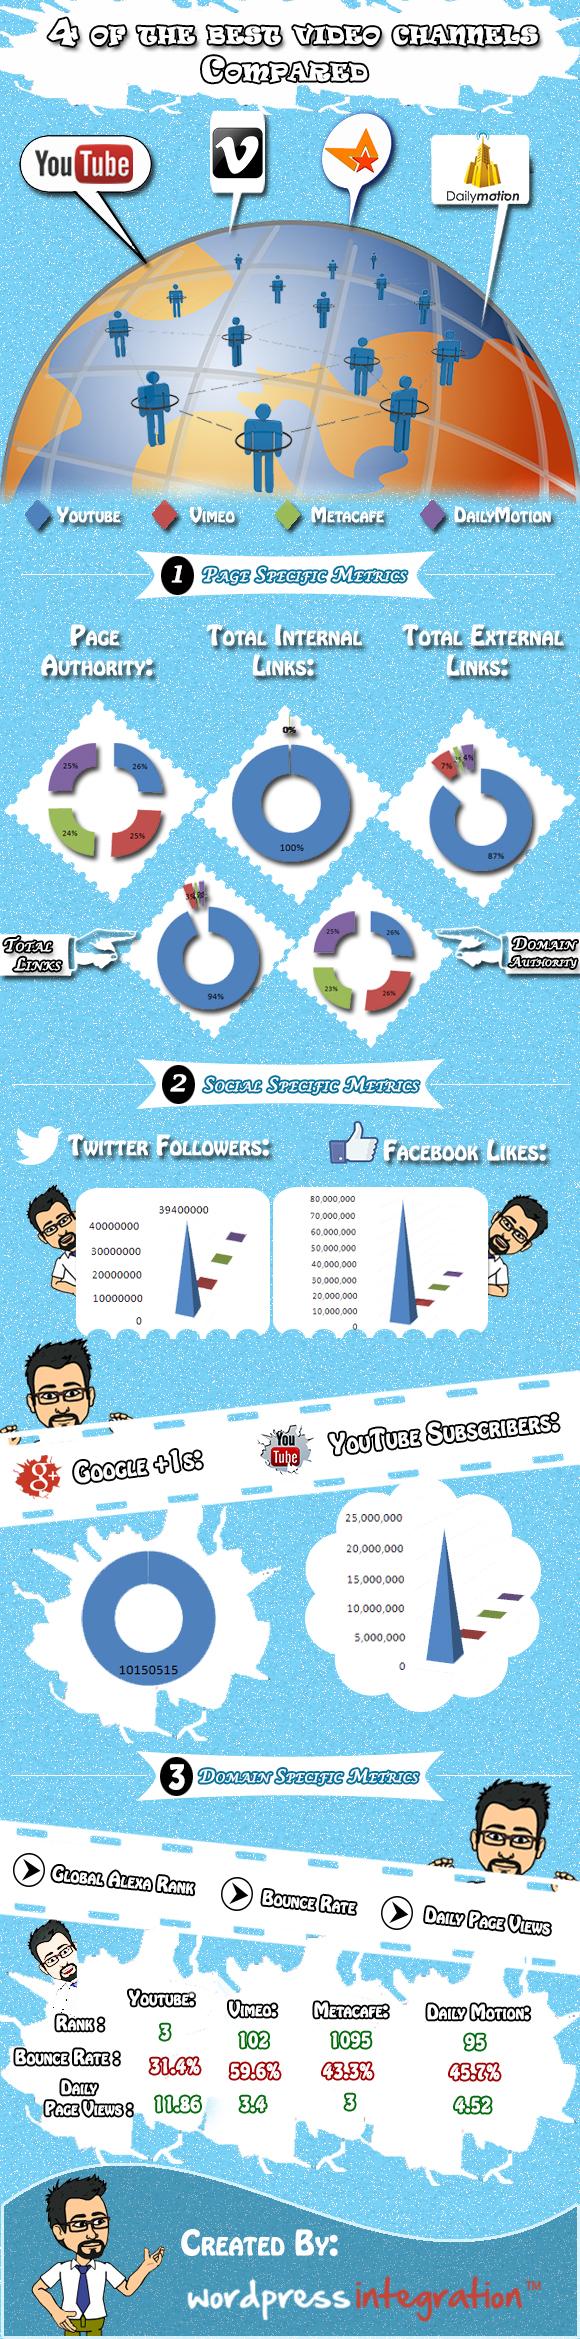 online video sharing platform comparison